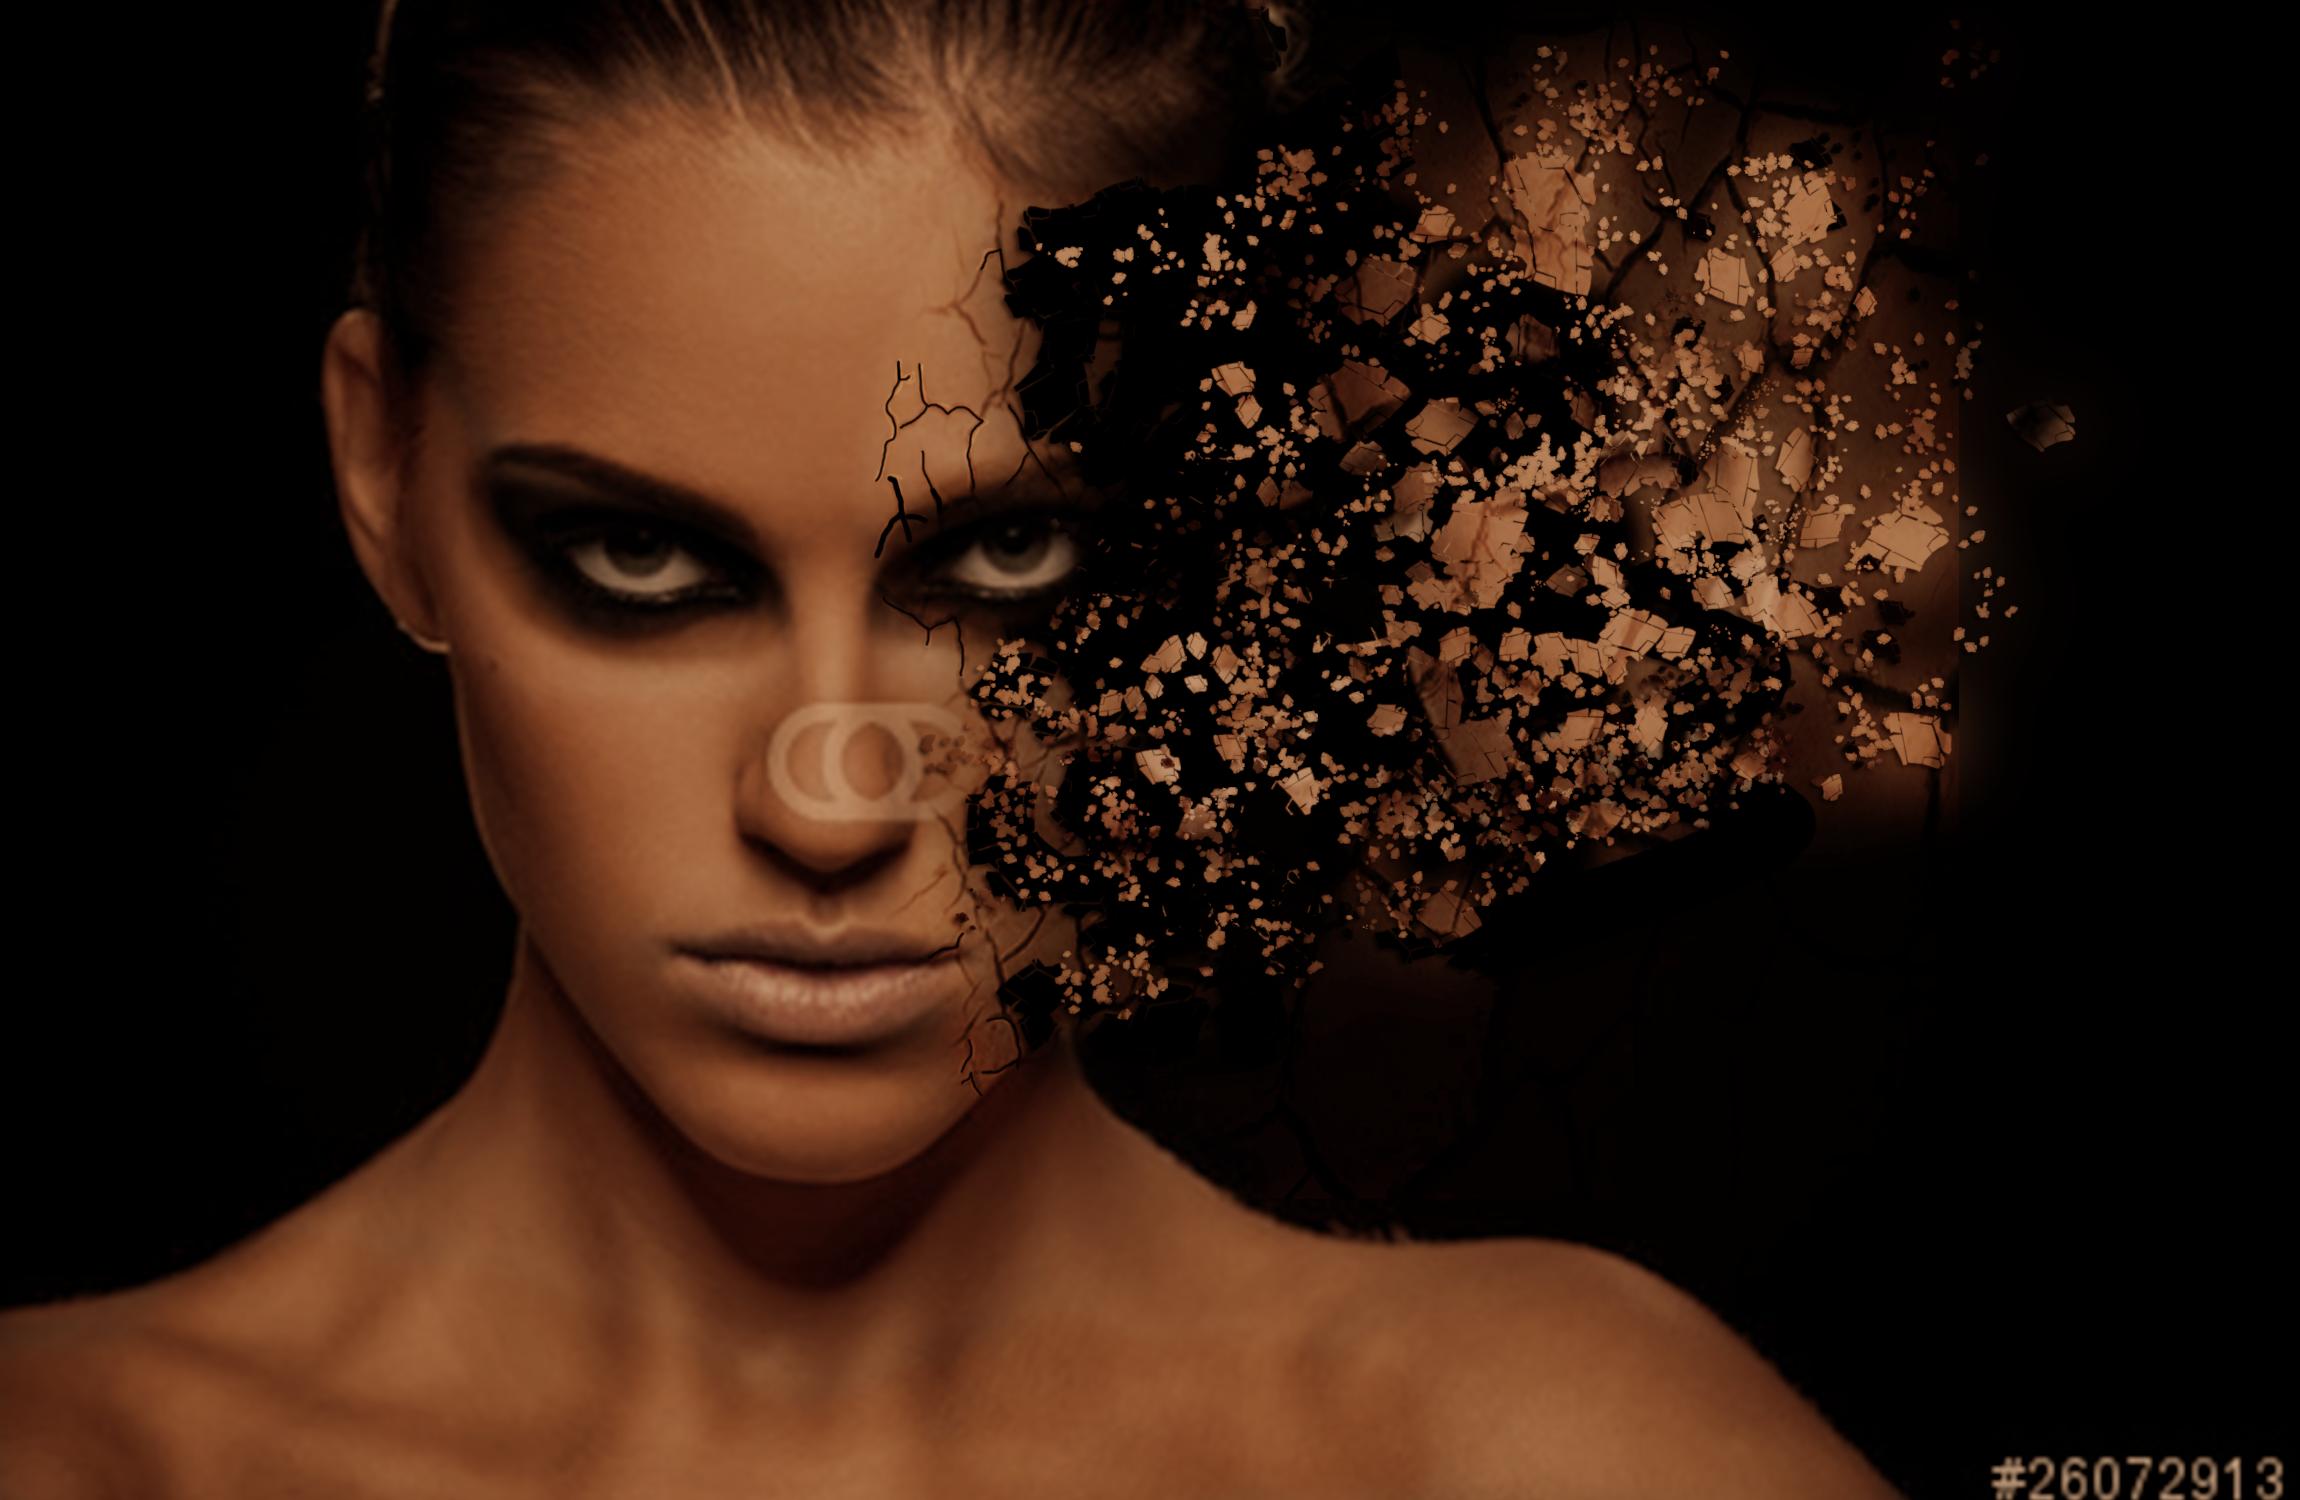 mes r u00e9alisations photoshop  u2013 karima kouidri portfolio